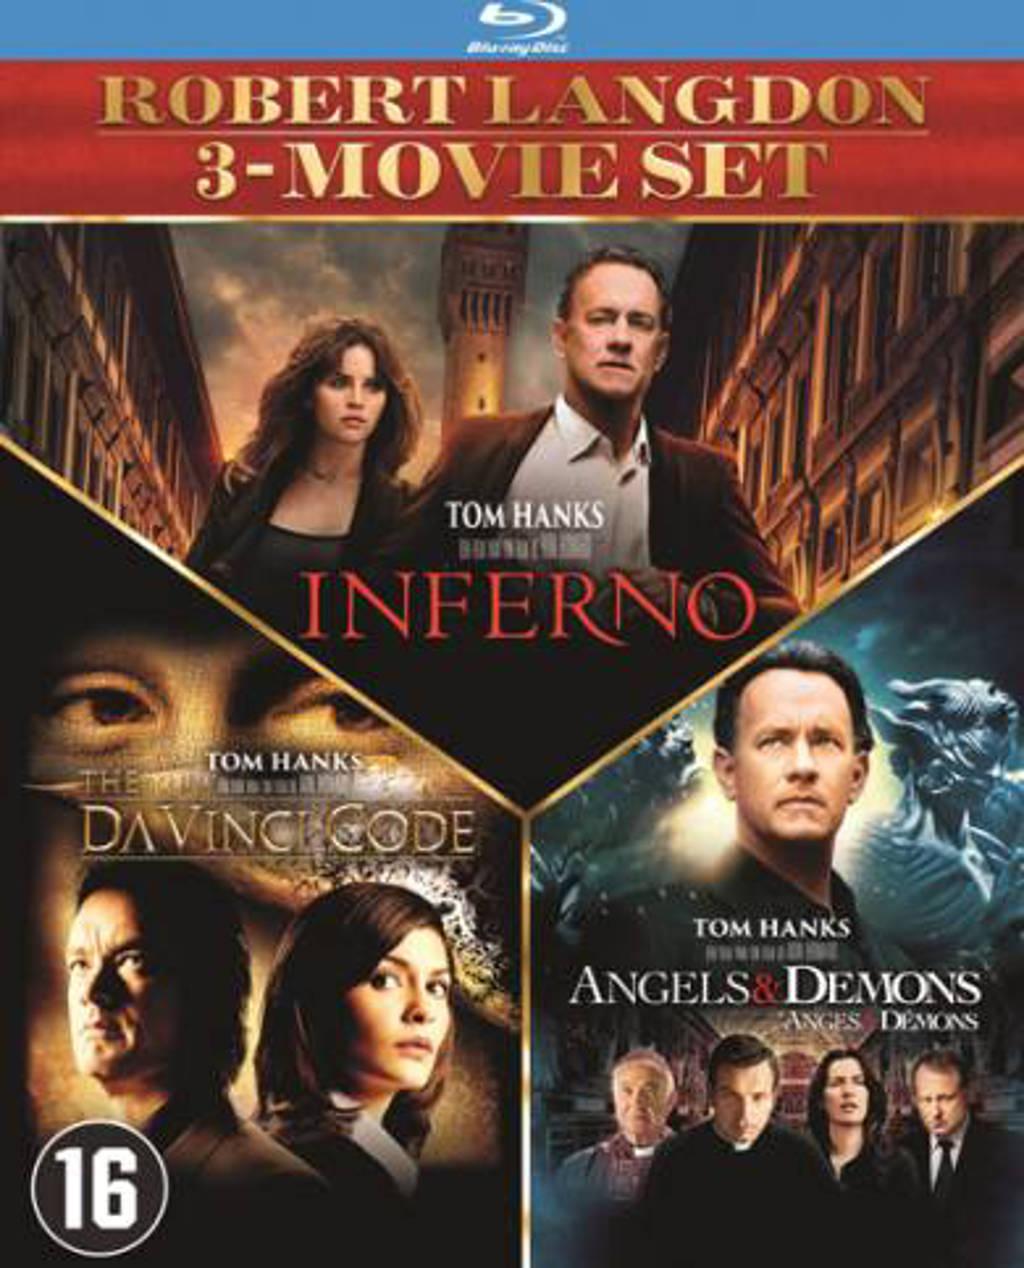 Da vinci code - Angels & demons - Inferno (Blu-ray)